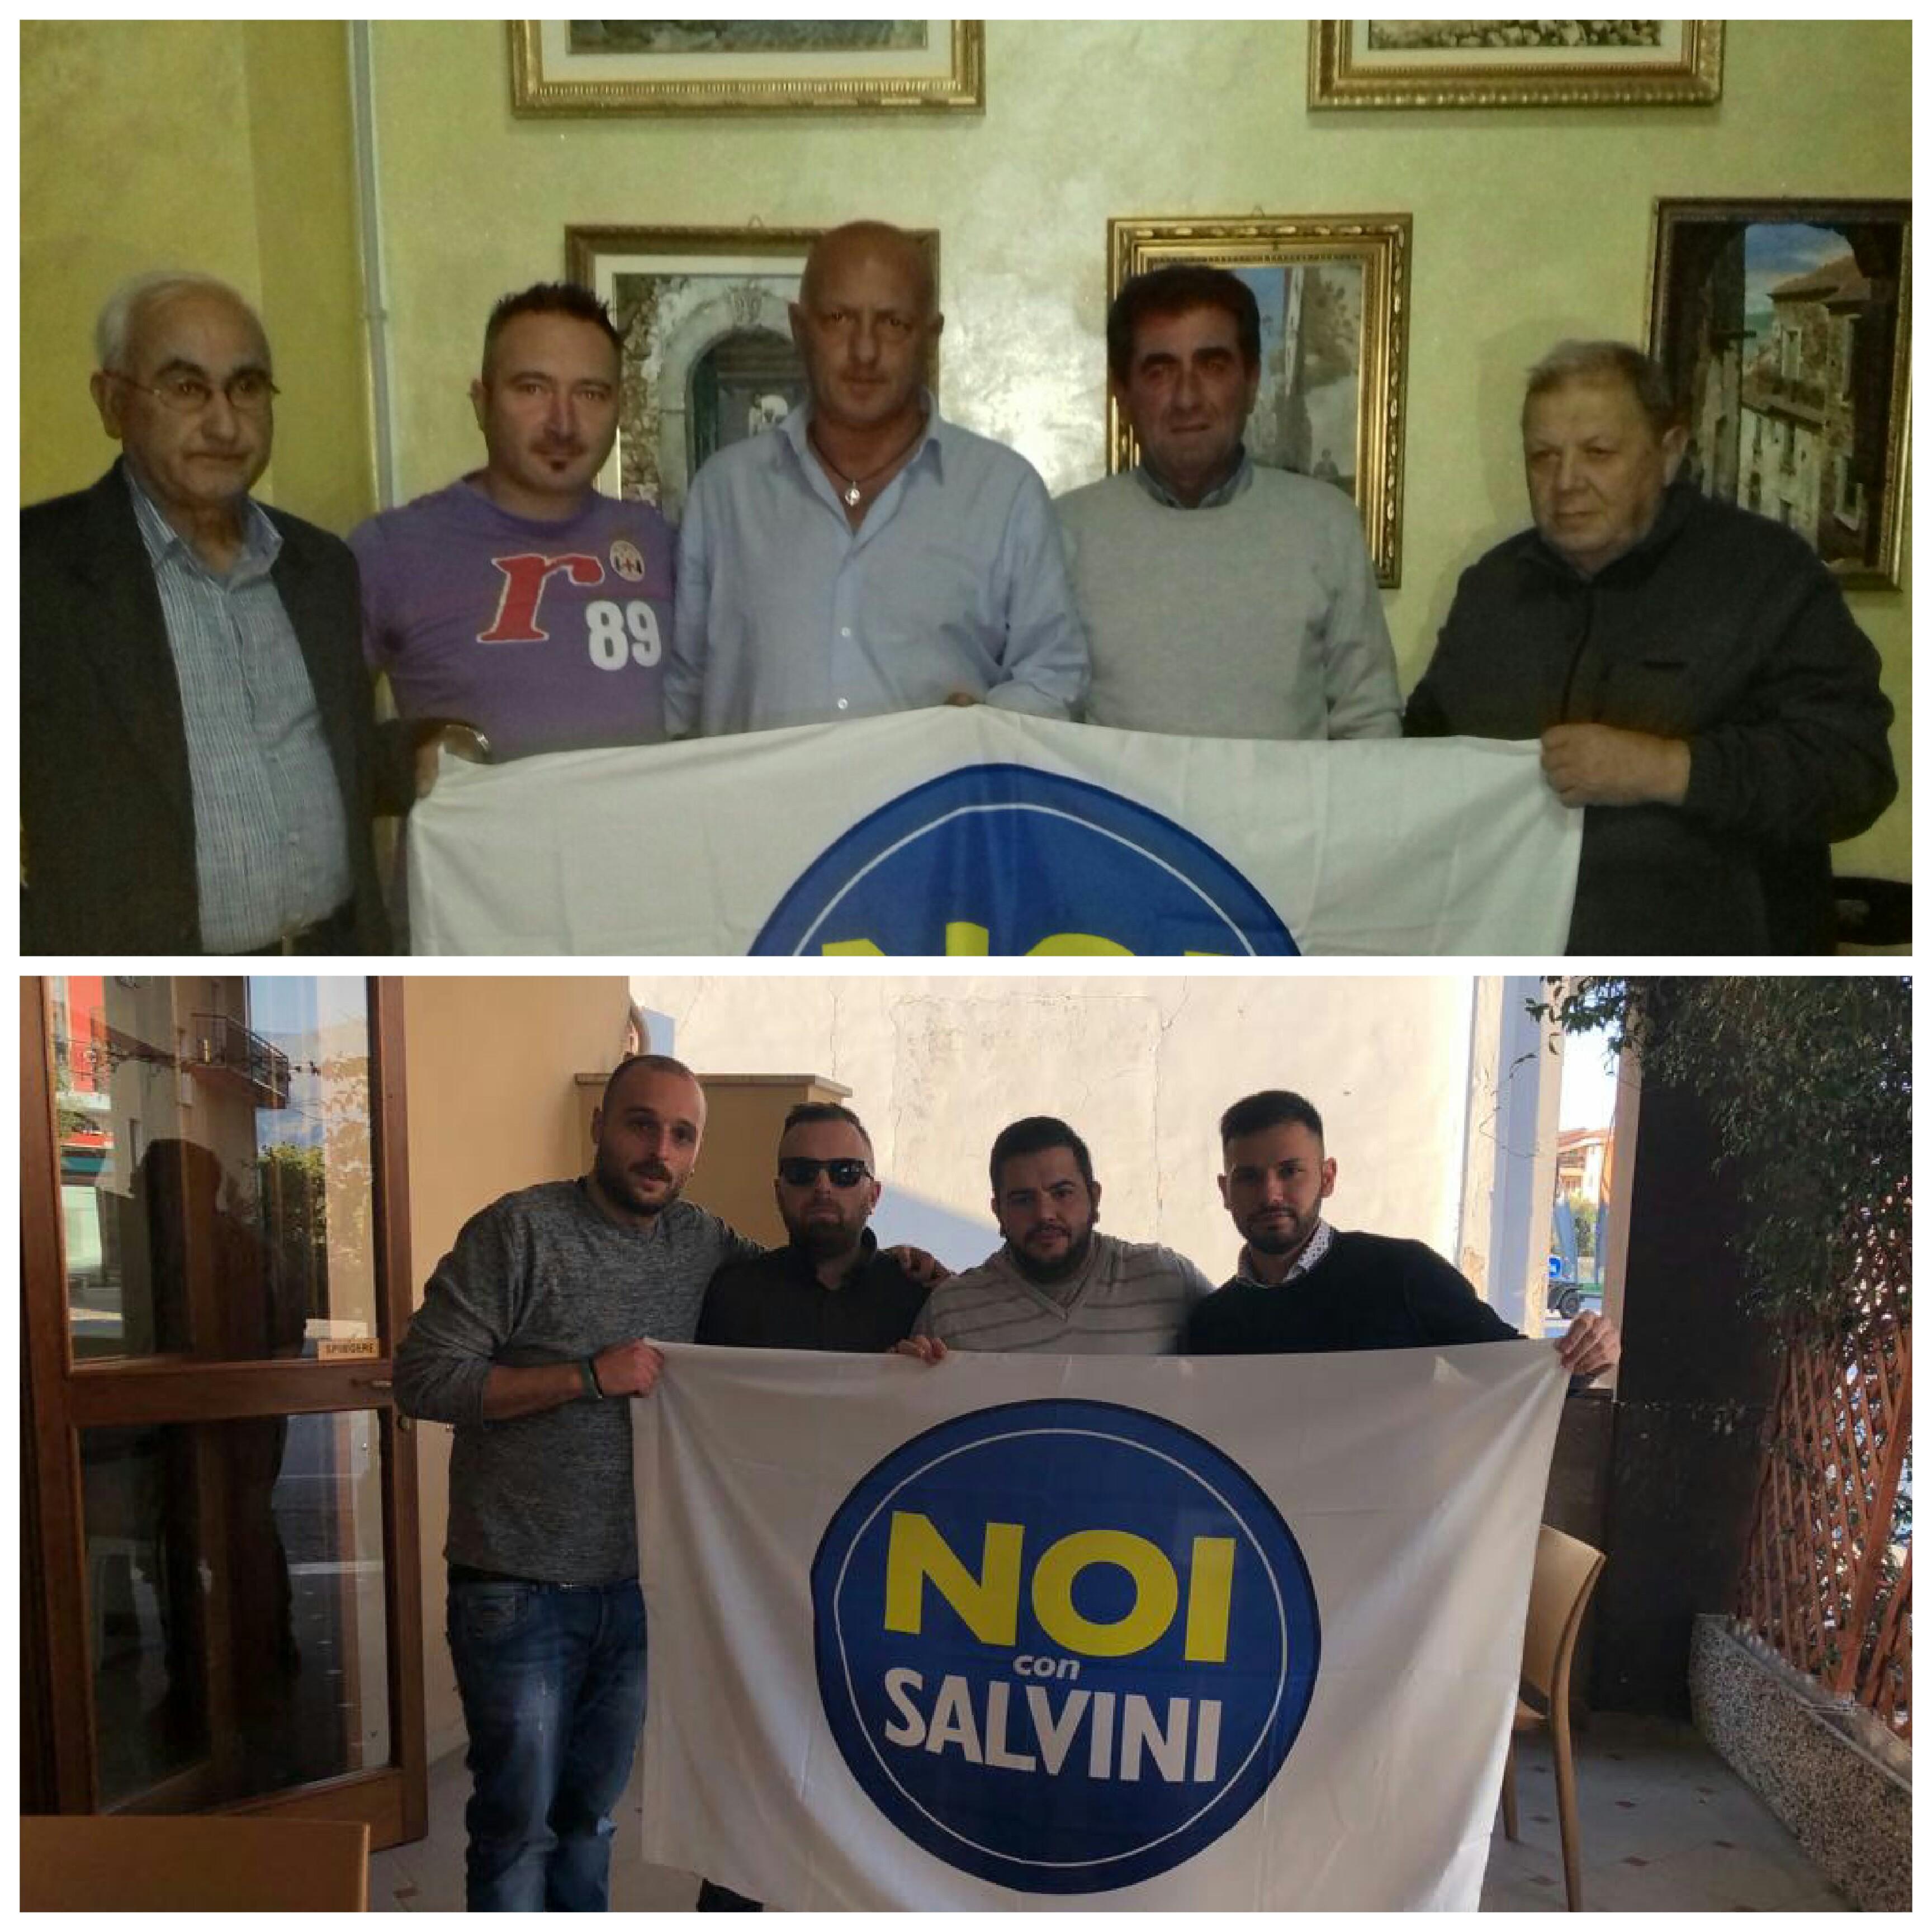 Noi con Salvini-Cicerale-San Pietro al Tanagro